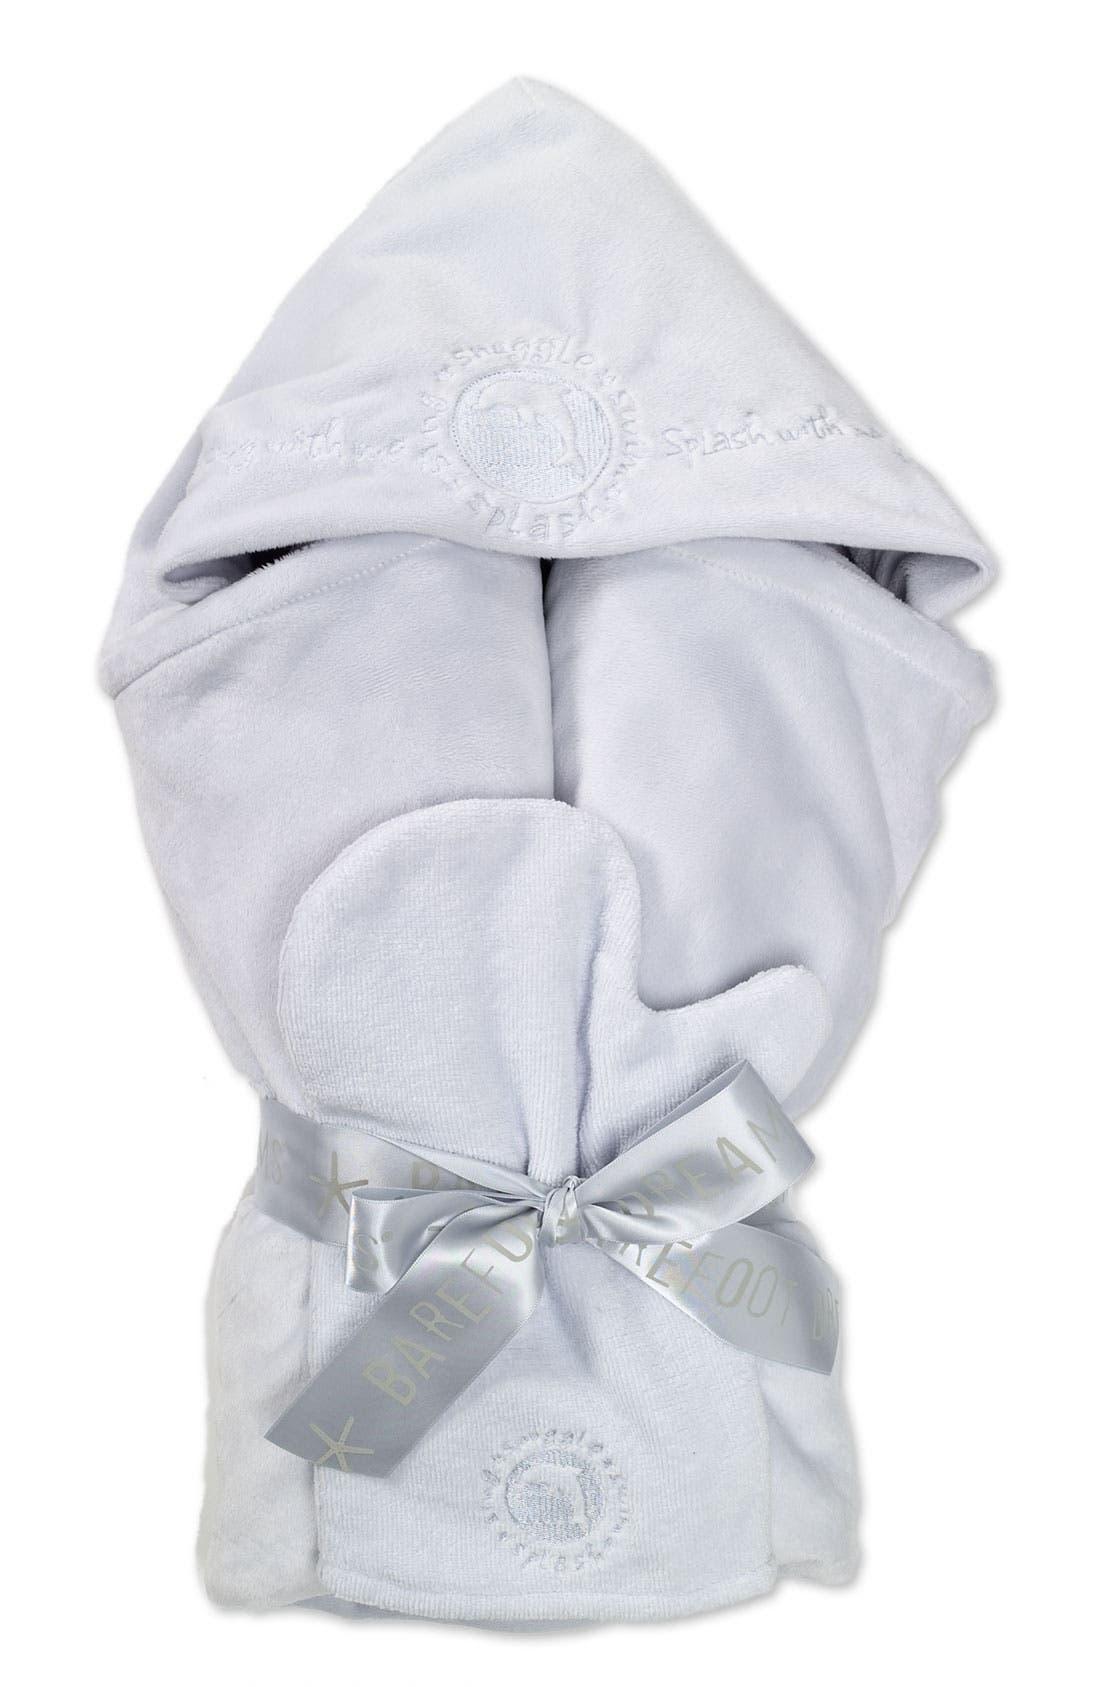 Main Image - Barefoot Dreams® Hooded Towel Set